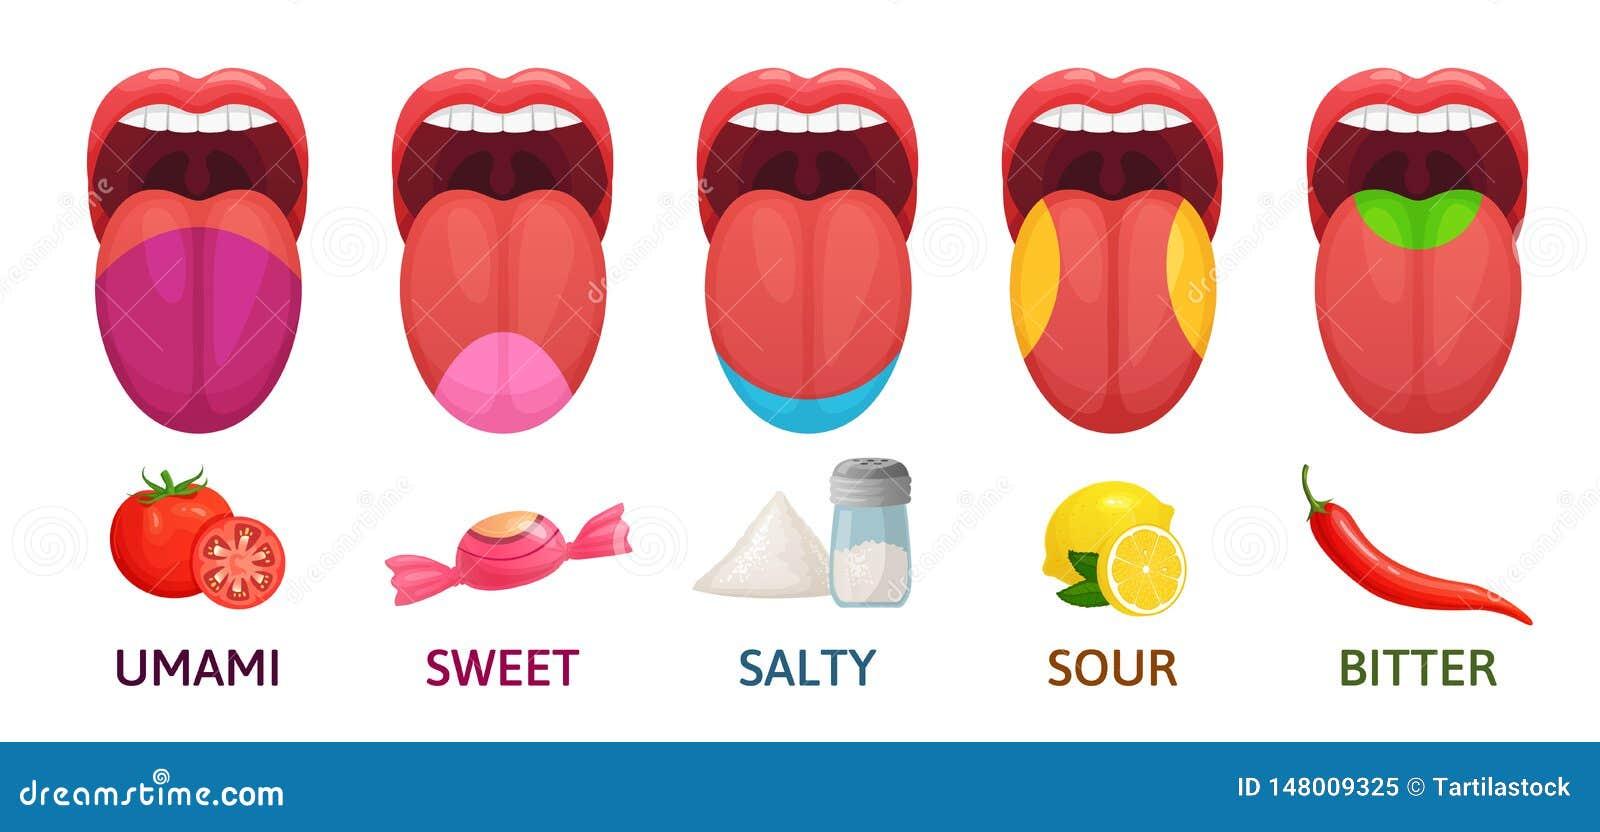 Tongue Taste Areas  Sweet, Bitter And Salty Tastes  Umami